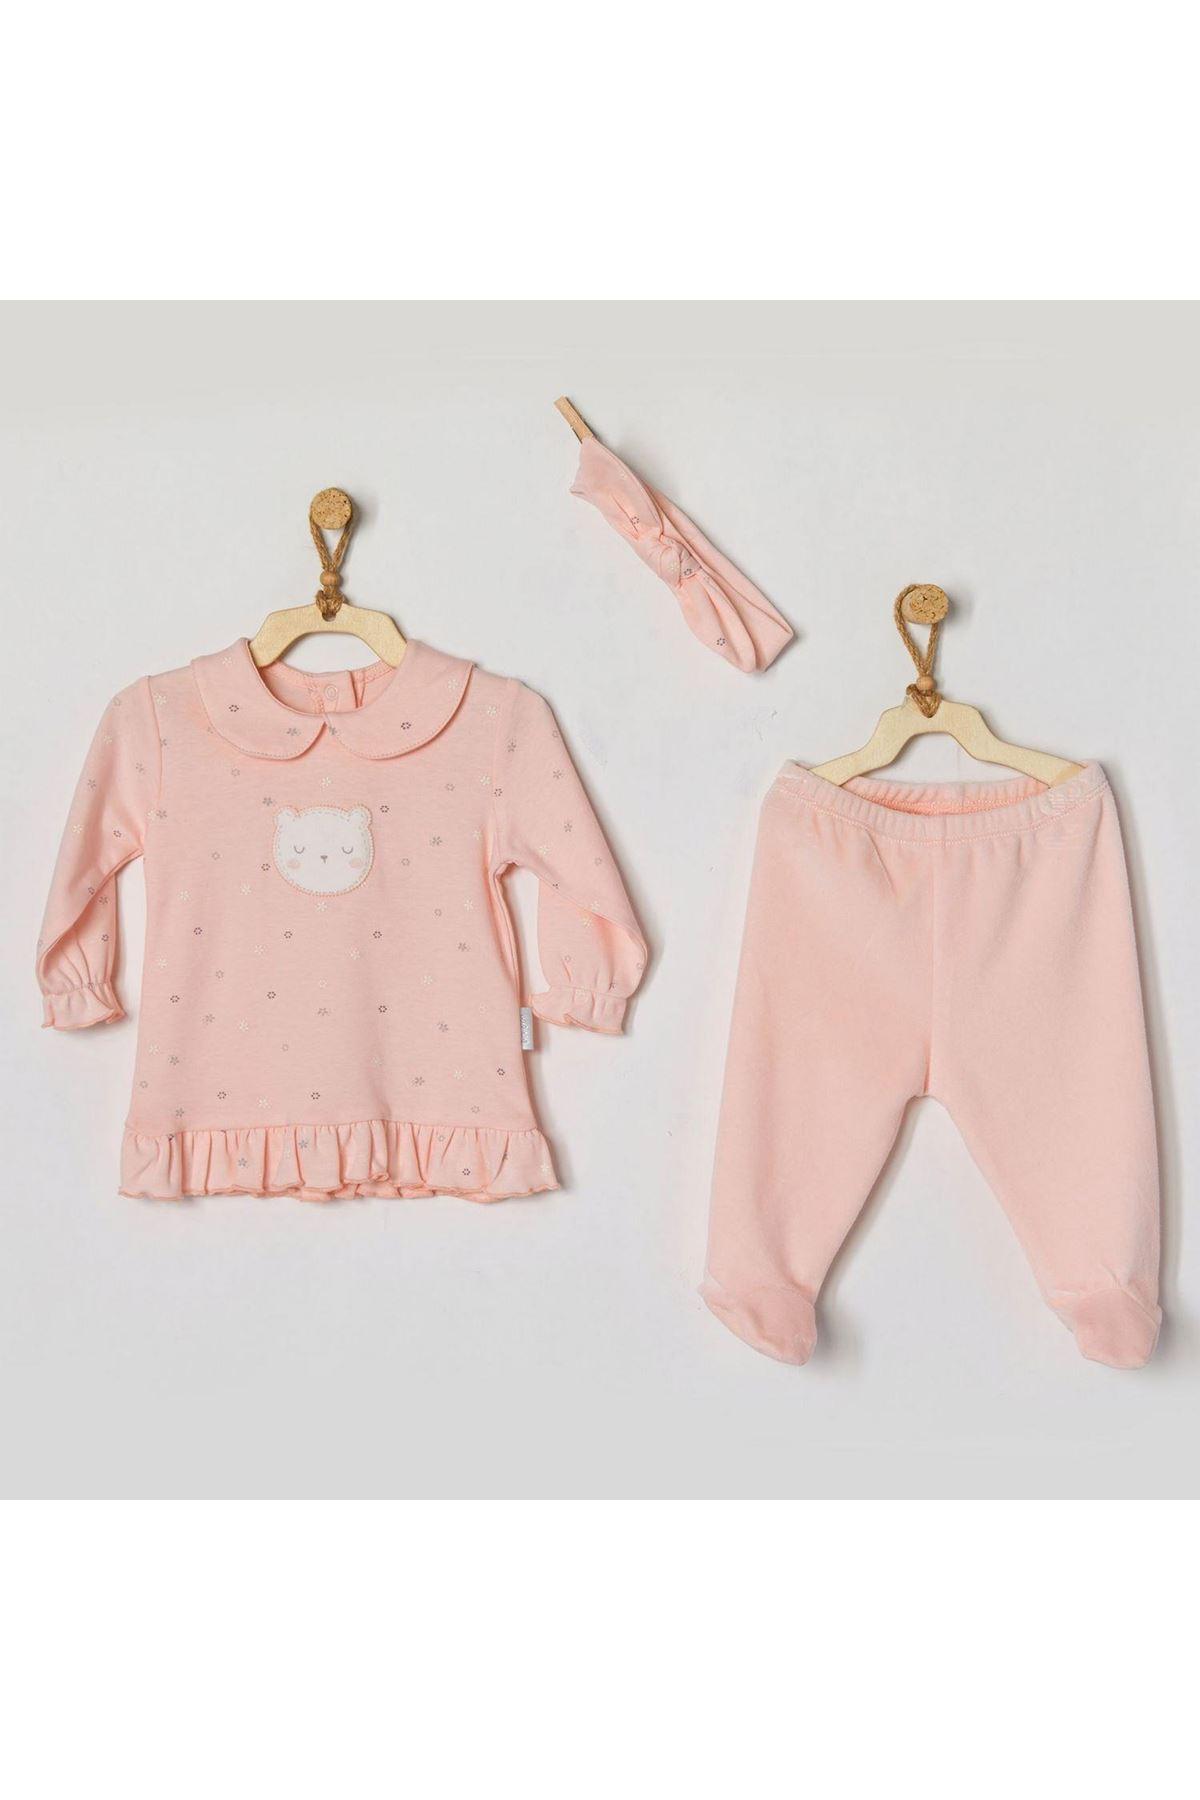 Andywawa AC22124 Home Sweet Home Kadife 3Lü Bebe Takım Pink